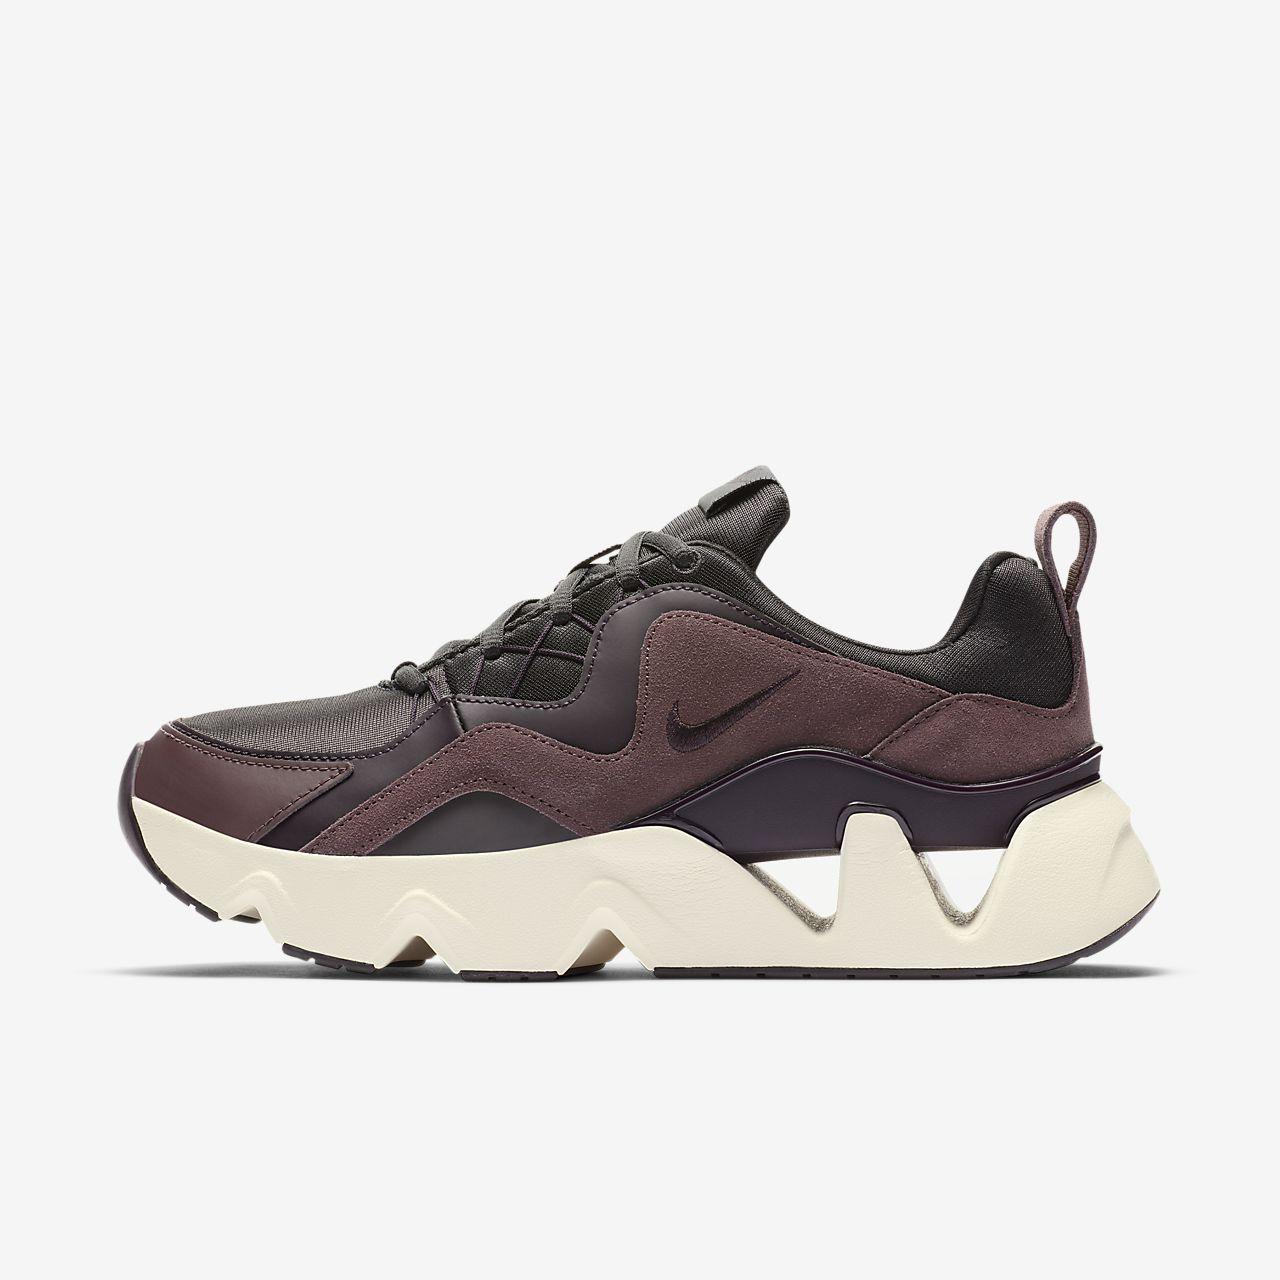 Nike RYZ 365-sko til kvinder